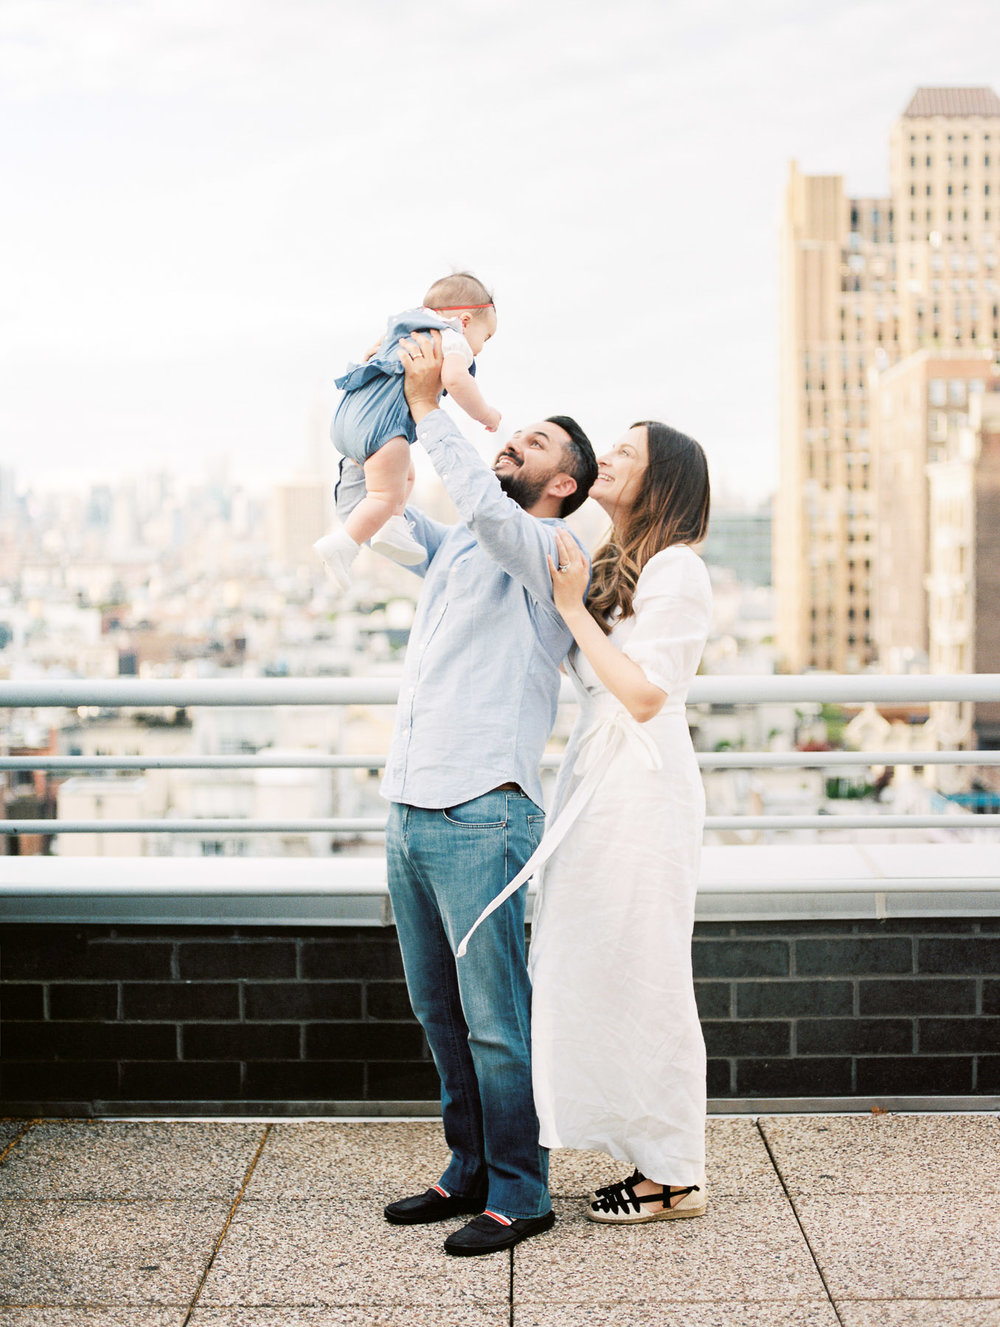 New York City Family Photography